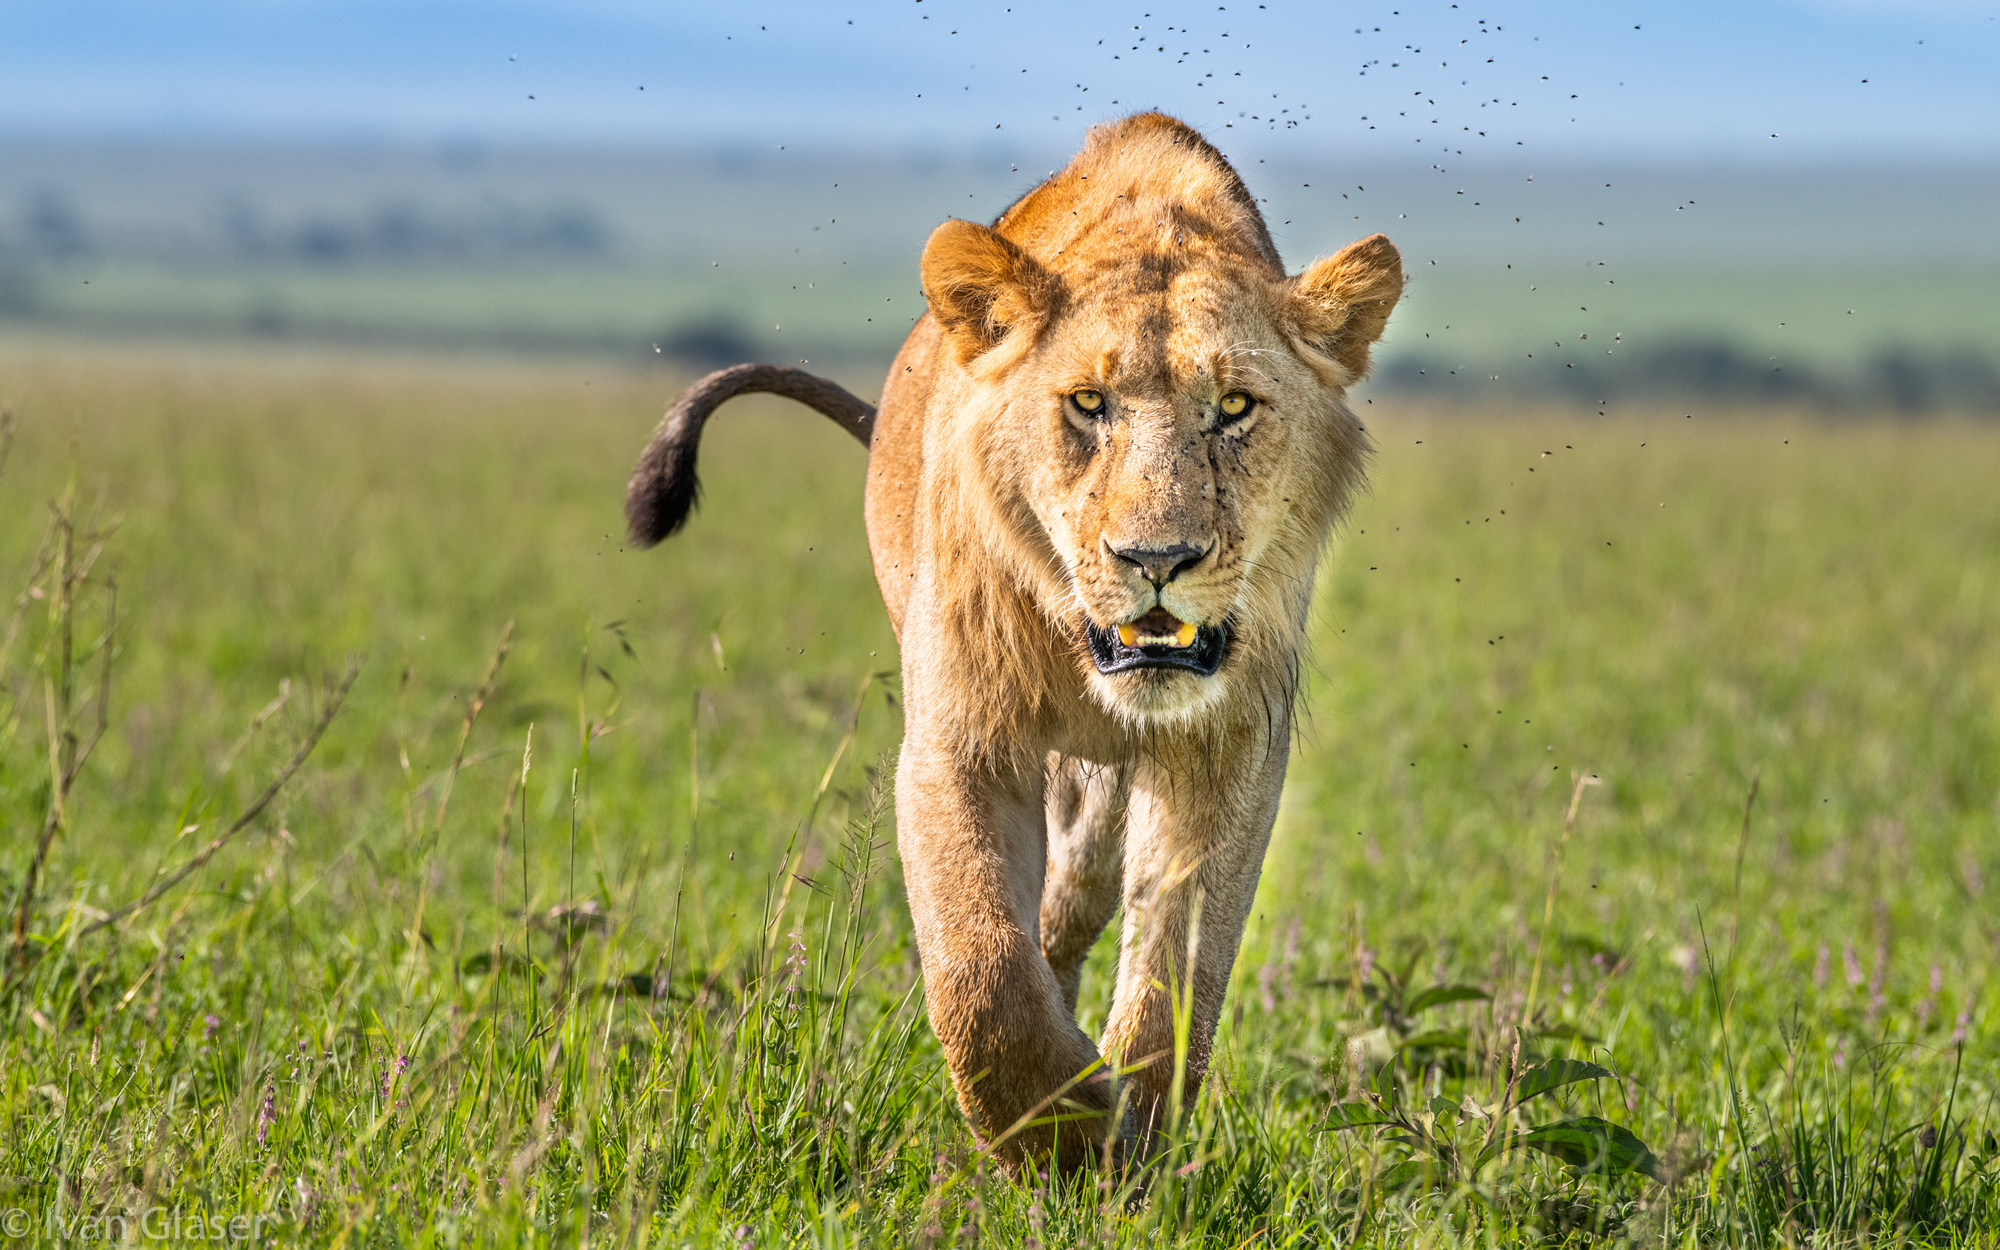 Sub-adult lion in Maasai Mara